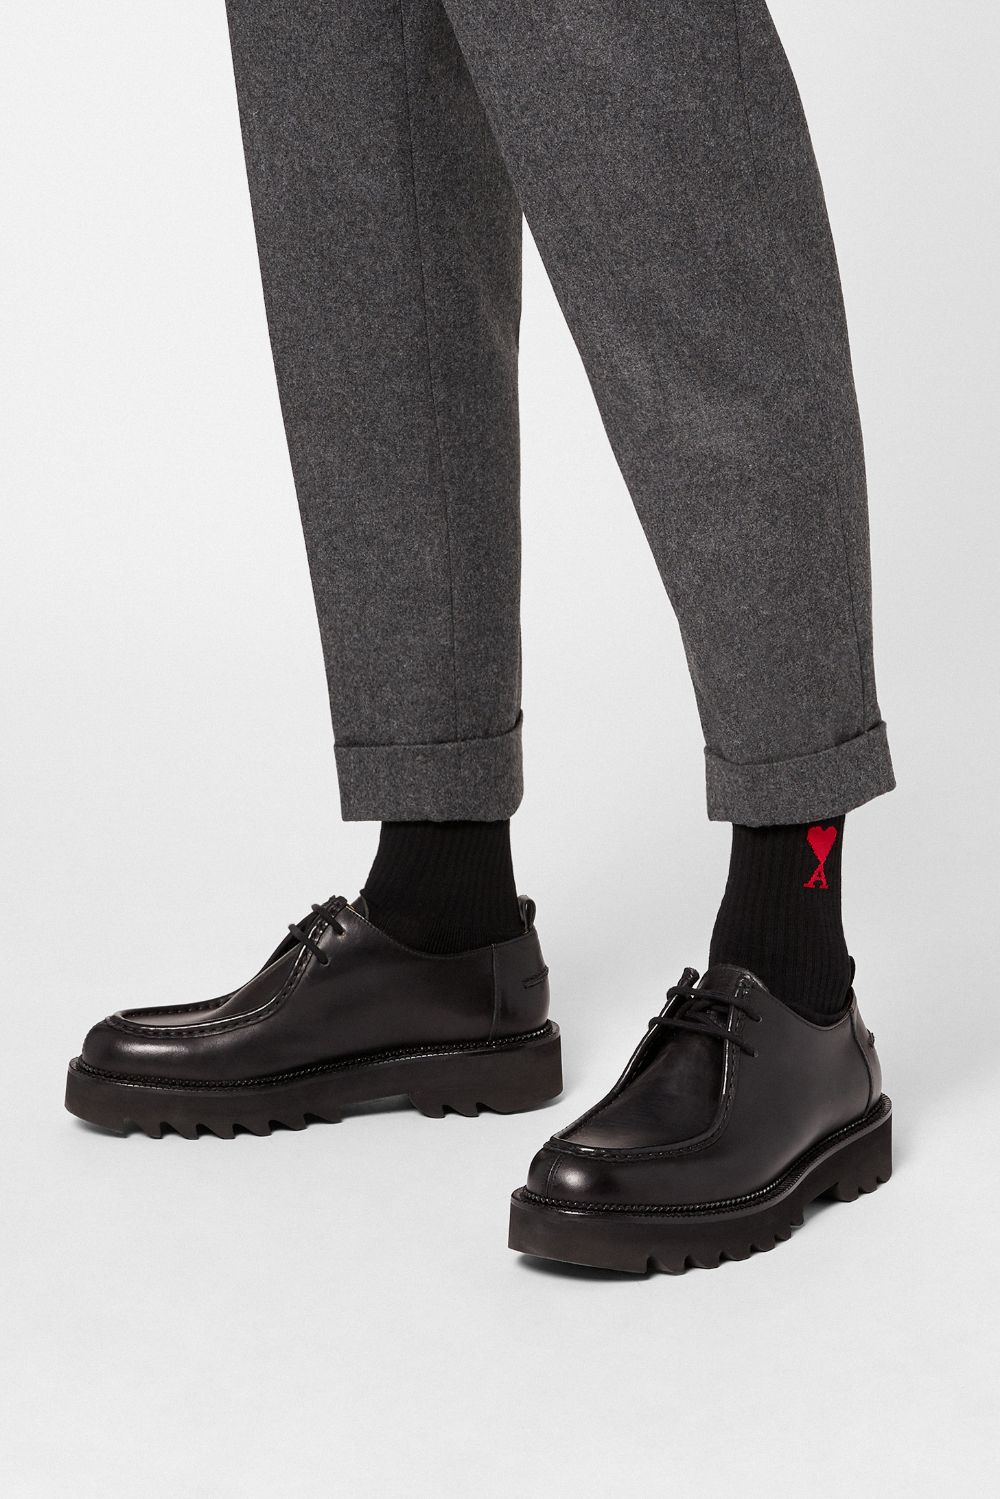 3 PACK LOGO SOCKS AMI - ALEXANDRE MATTIUSSI | Socks | BFA600.377001